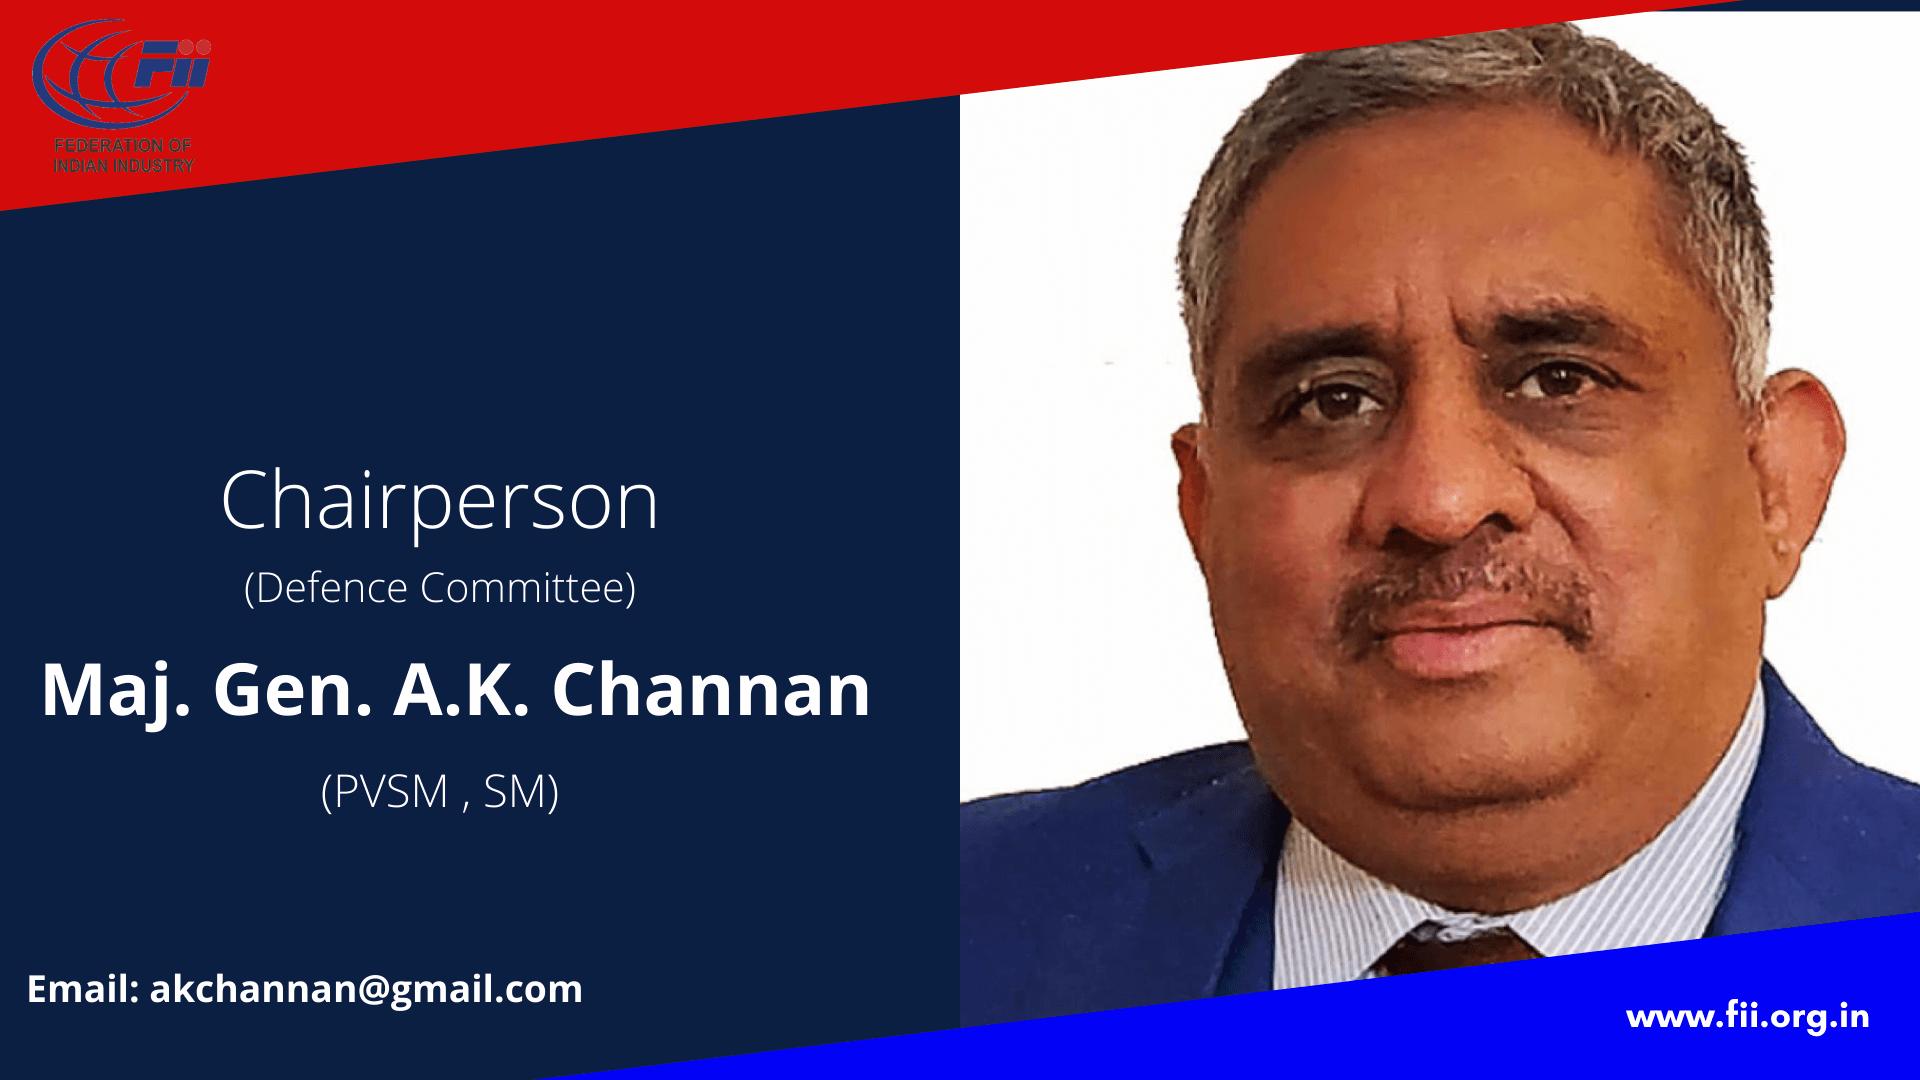 Maj. Gen. Ashwani Kumar Channan Chairperson, Defence Committee